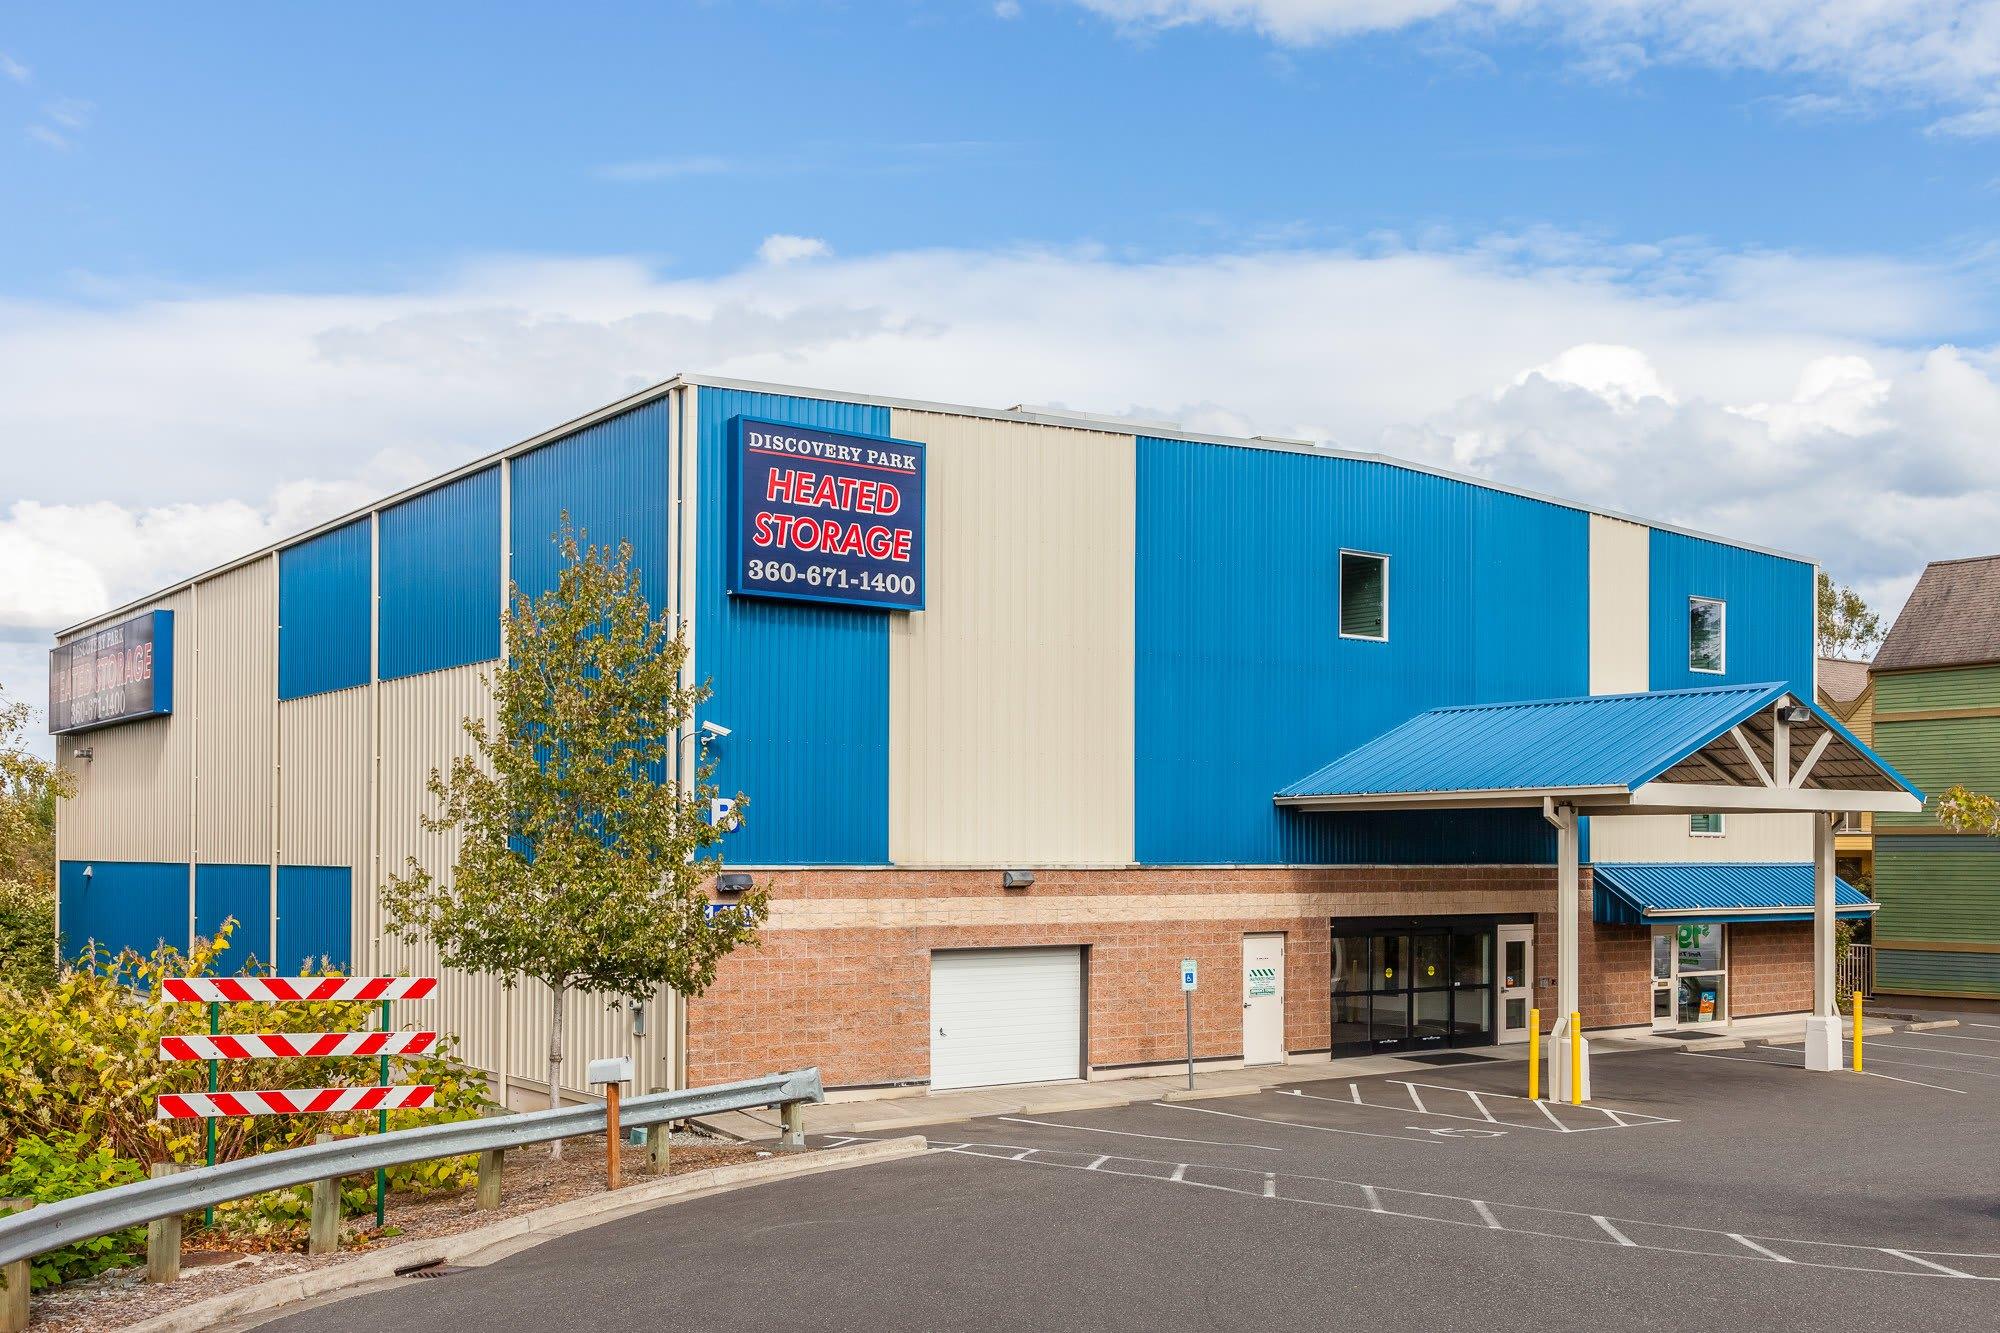 Exterior of self storage facility in Bellingham, Washington